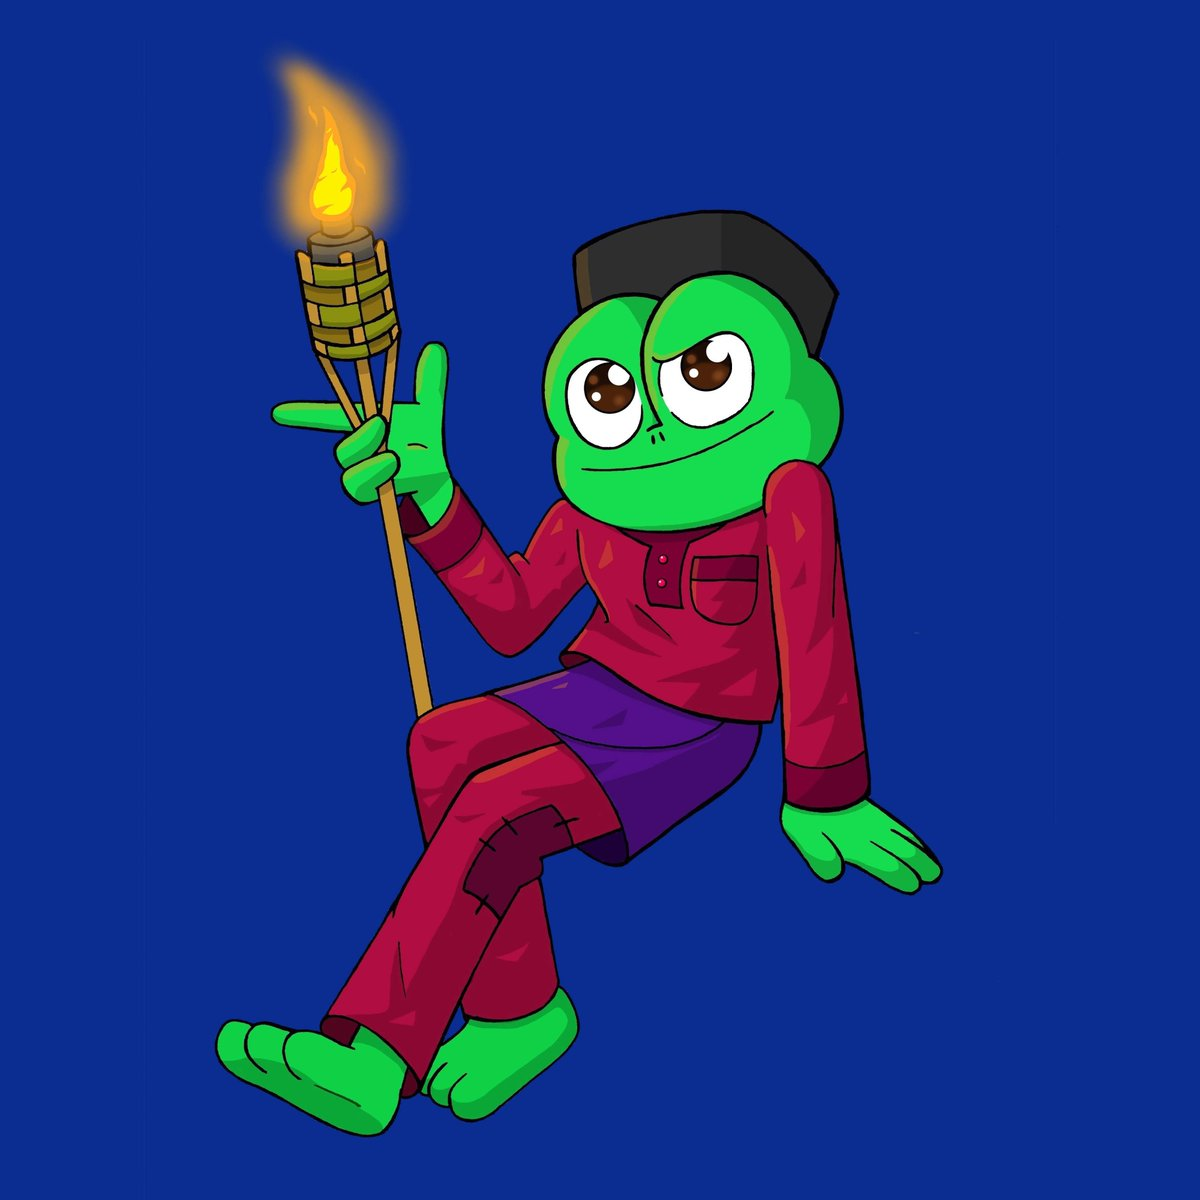 I just want to post something. :) #draw #art #ArtistOnTwitter #EidMubarak #FrogFriday #frog<br>http://pic.twitter.com/JnAHnV8FEE